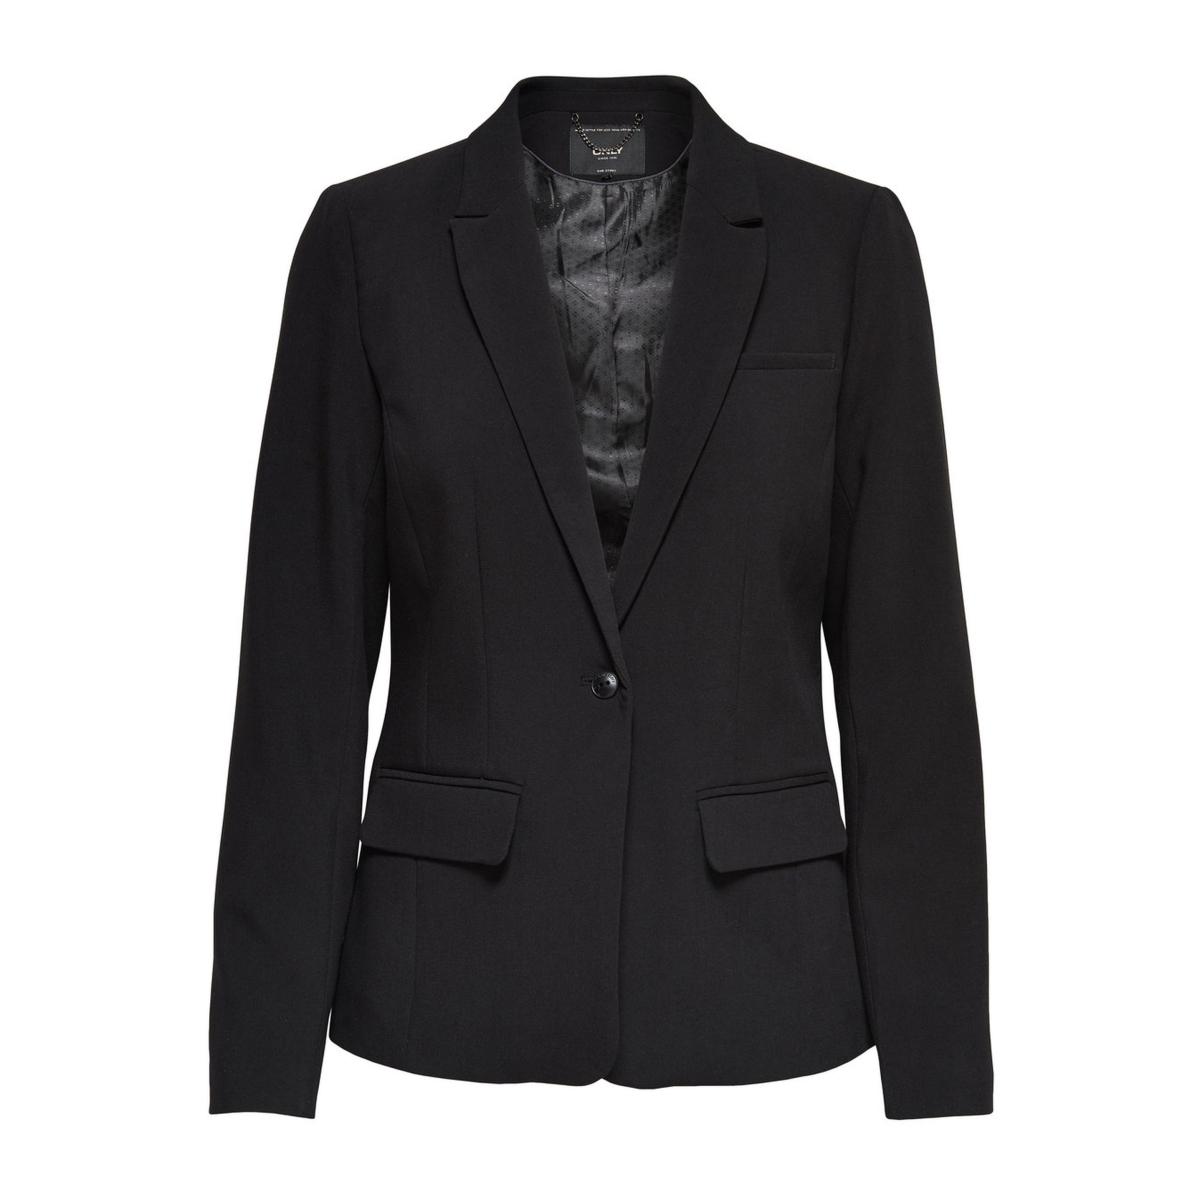 onlnicole blazer pnt  noos 15144204 only blazer black